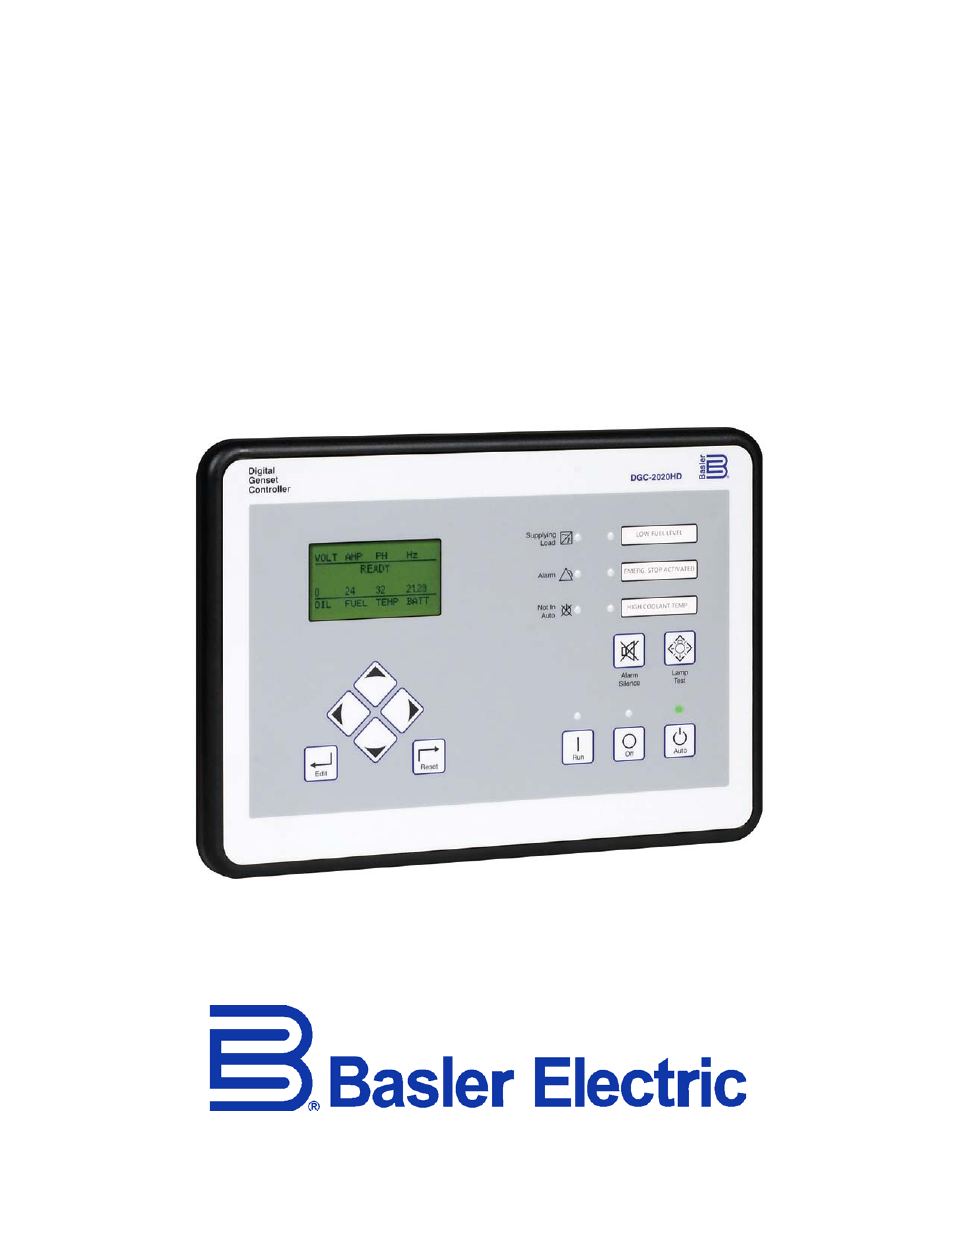 Basler Electric DGC-2020HD User Manual   404 pages   Basler Generator Wiring Diagram      Manuals Directory